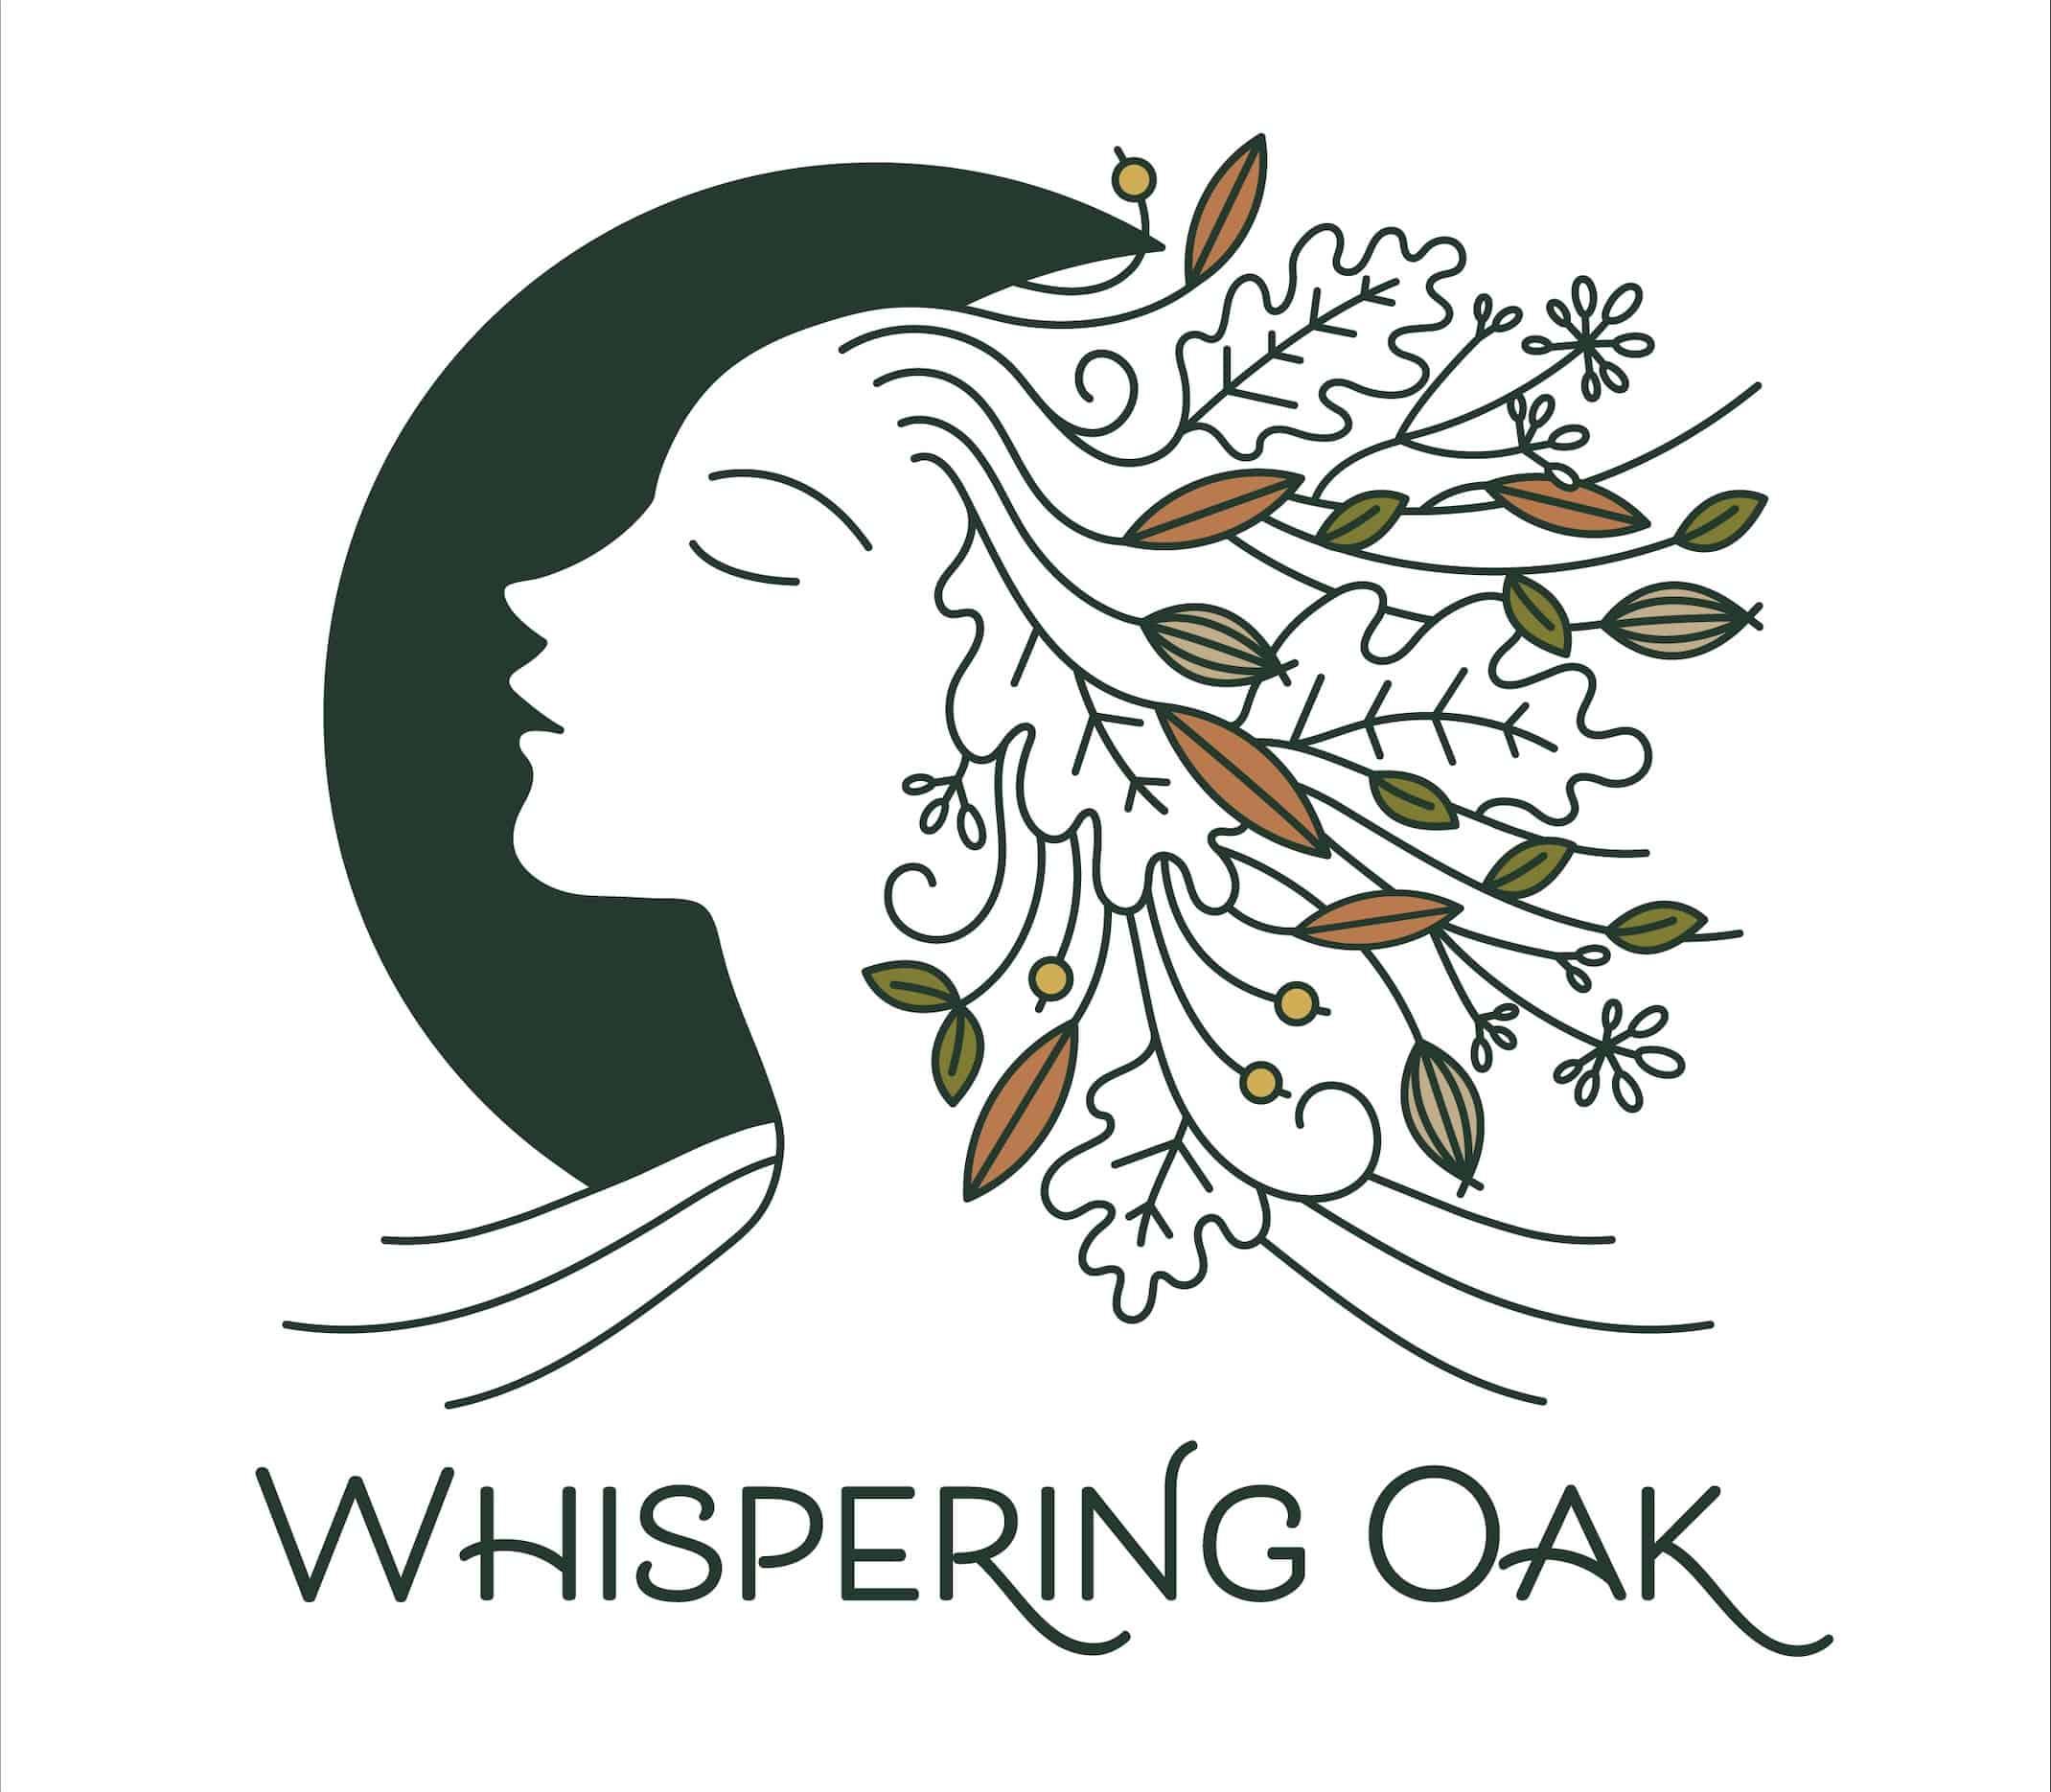 Whispering Oak Tonic